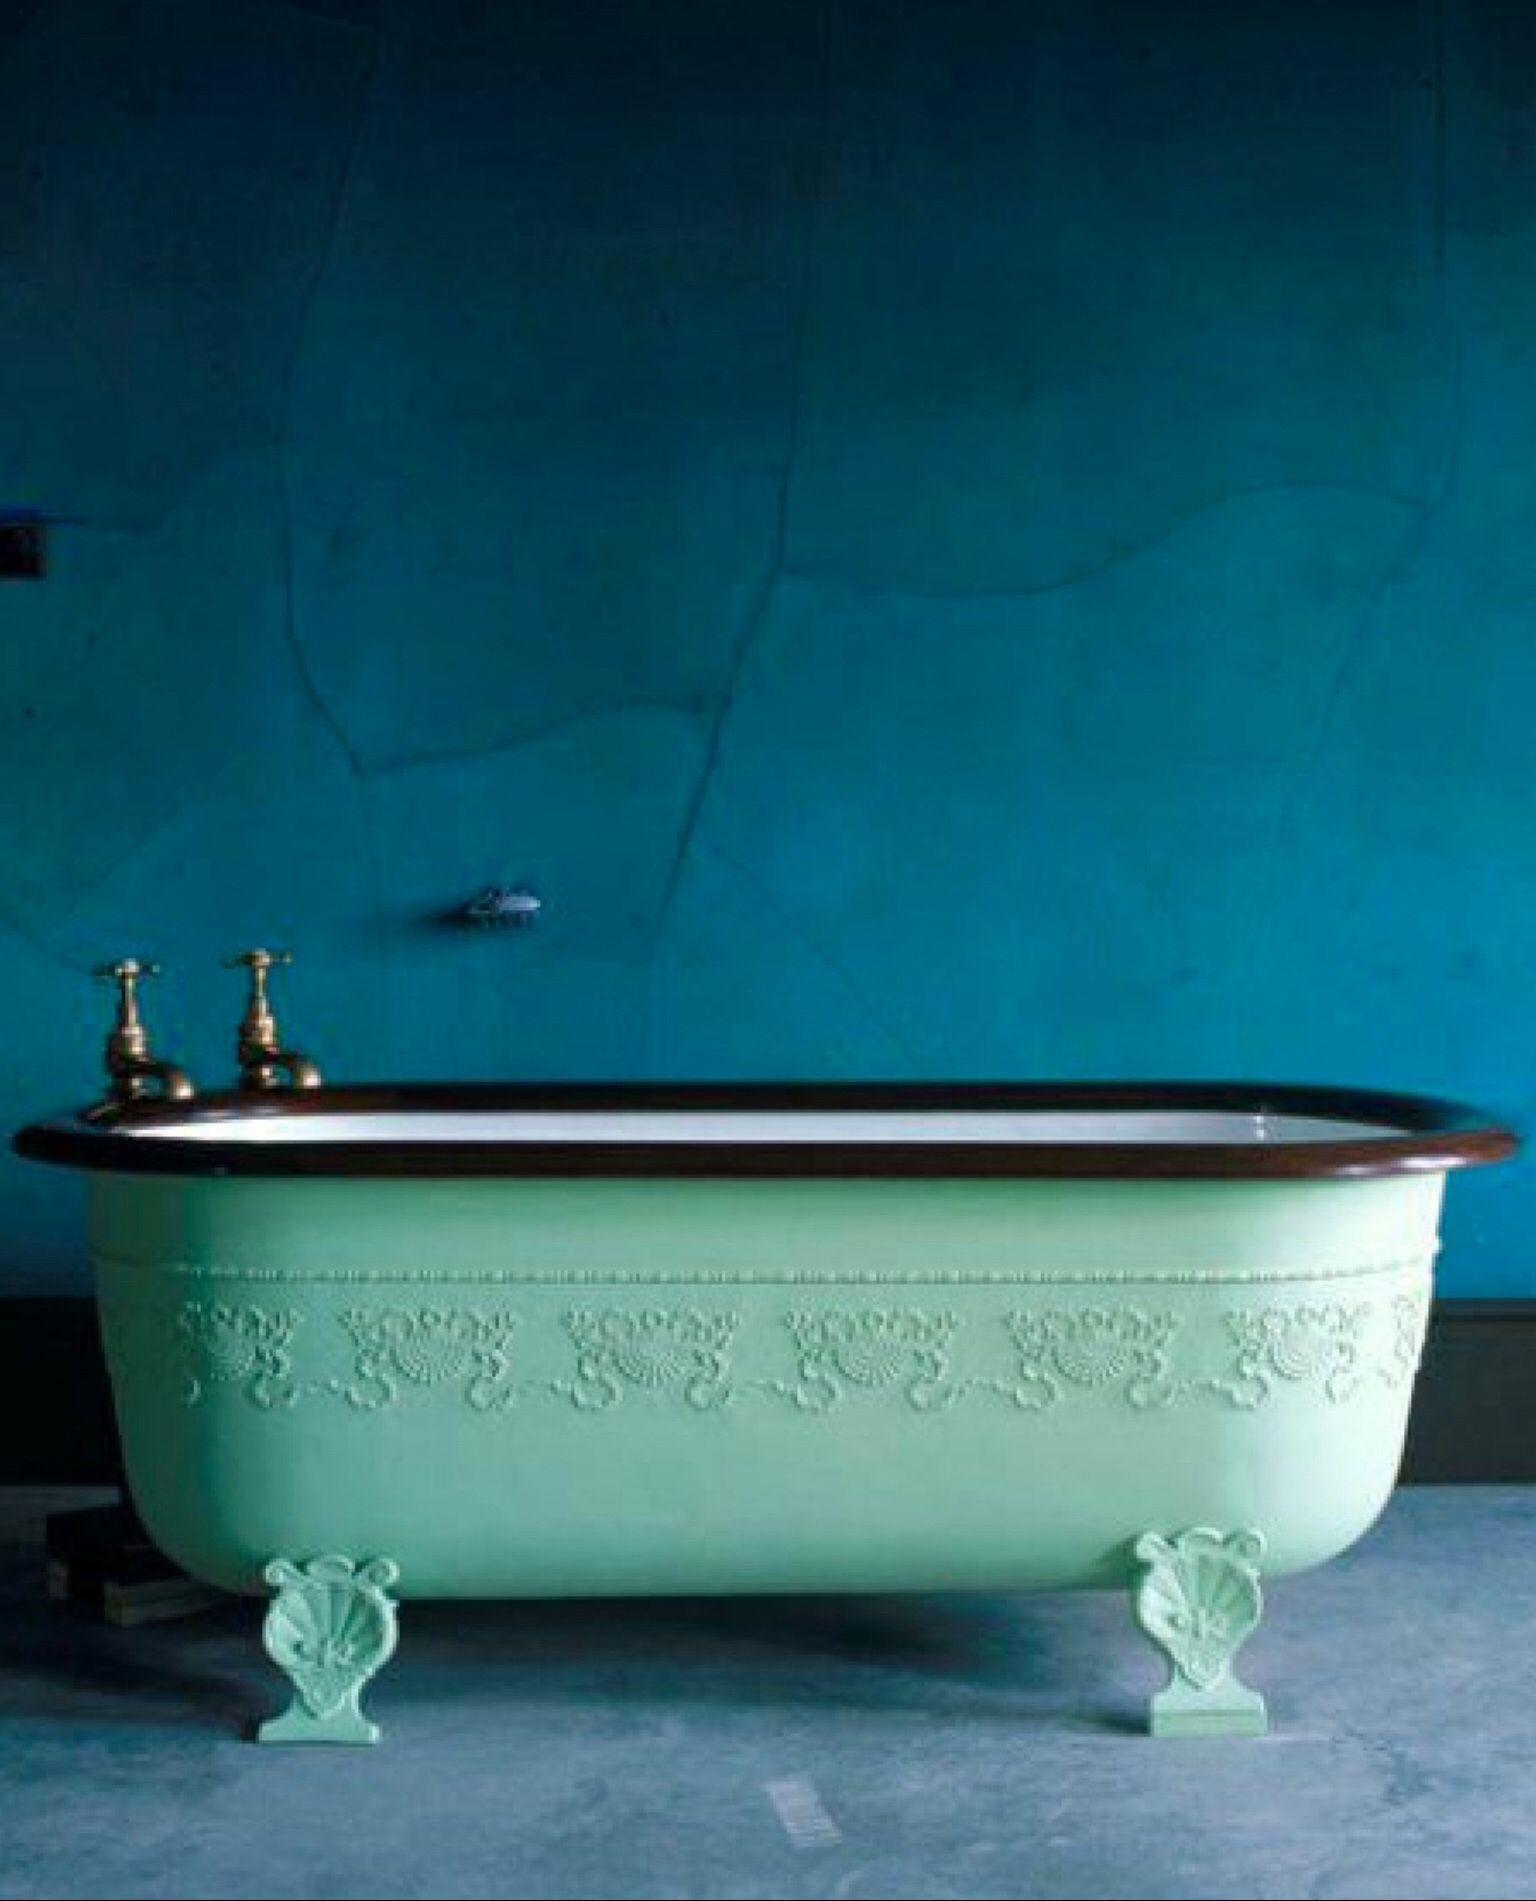 22 badrum i vintagestil – som hämtade ur en saga | Monopoly, Emboss ...